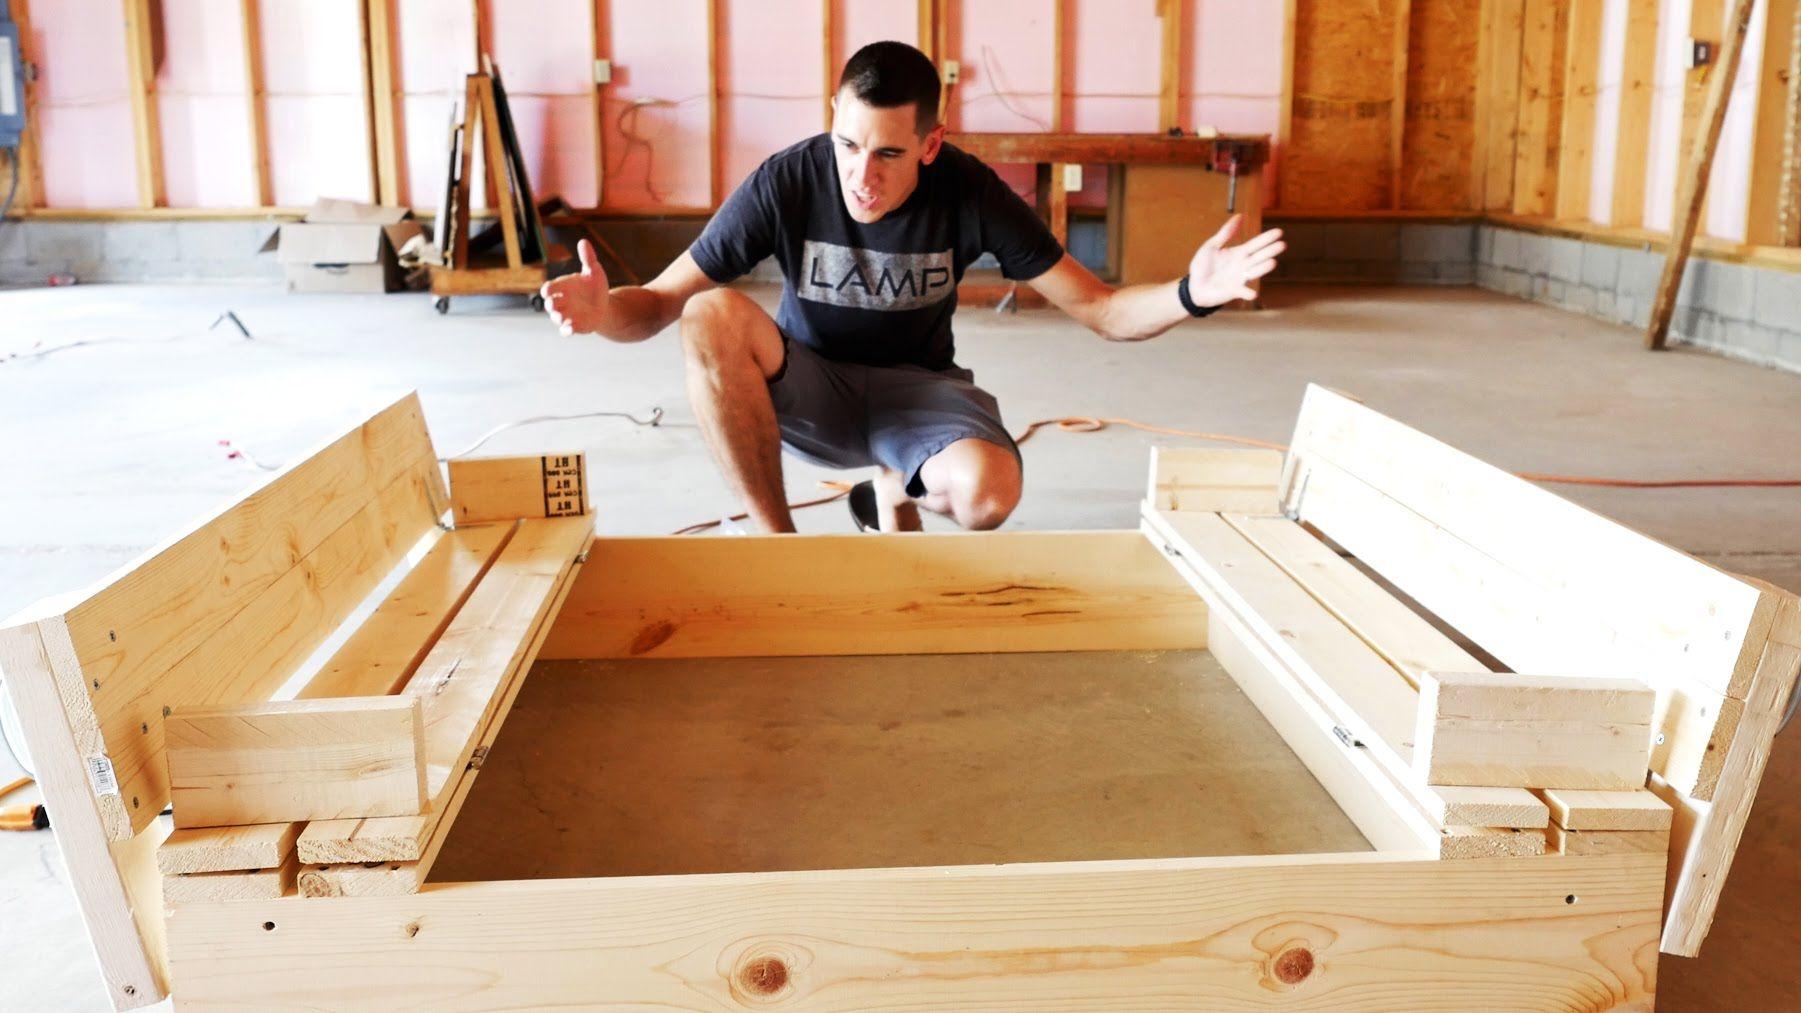 How To Build A Sandbox With Bench Seats Diy Sandbox Ideen